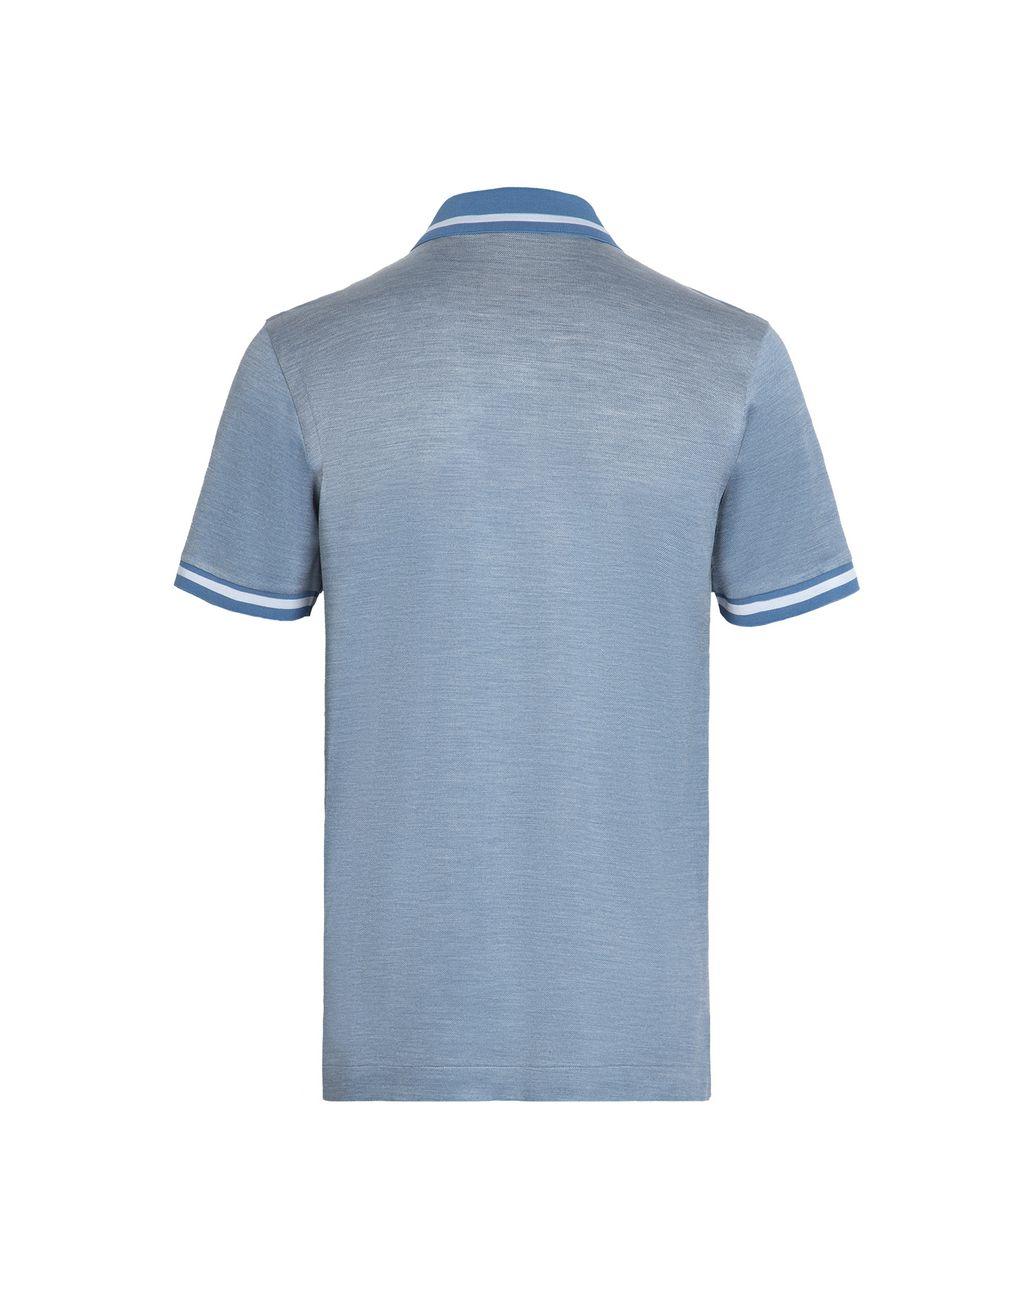 BRIONI Iridescent Sky Blue Polo Shirt T-Shirts & Polos Man d